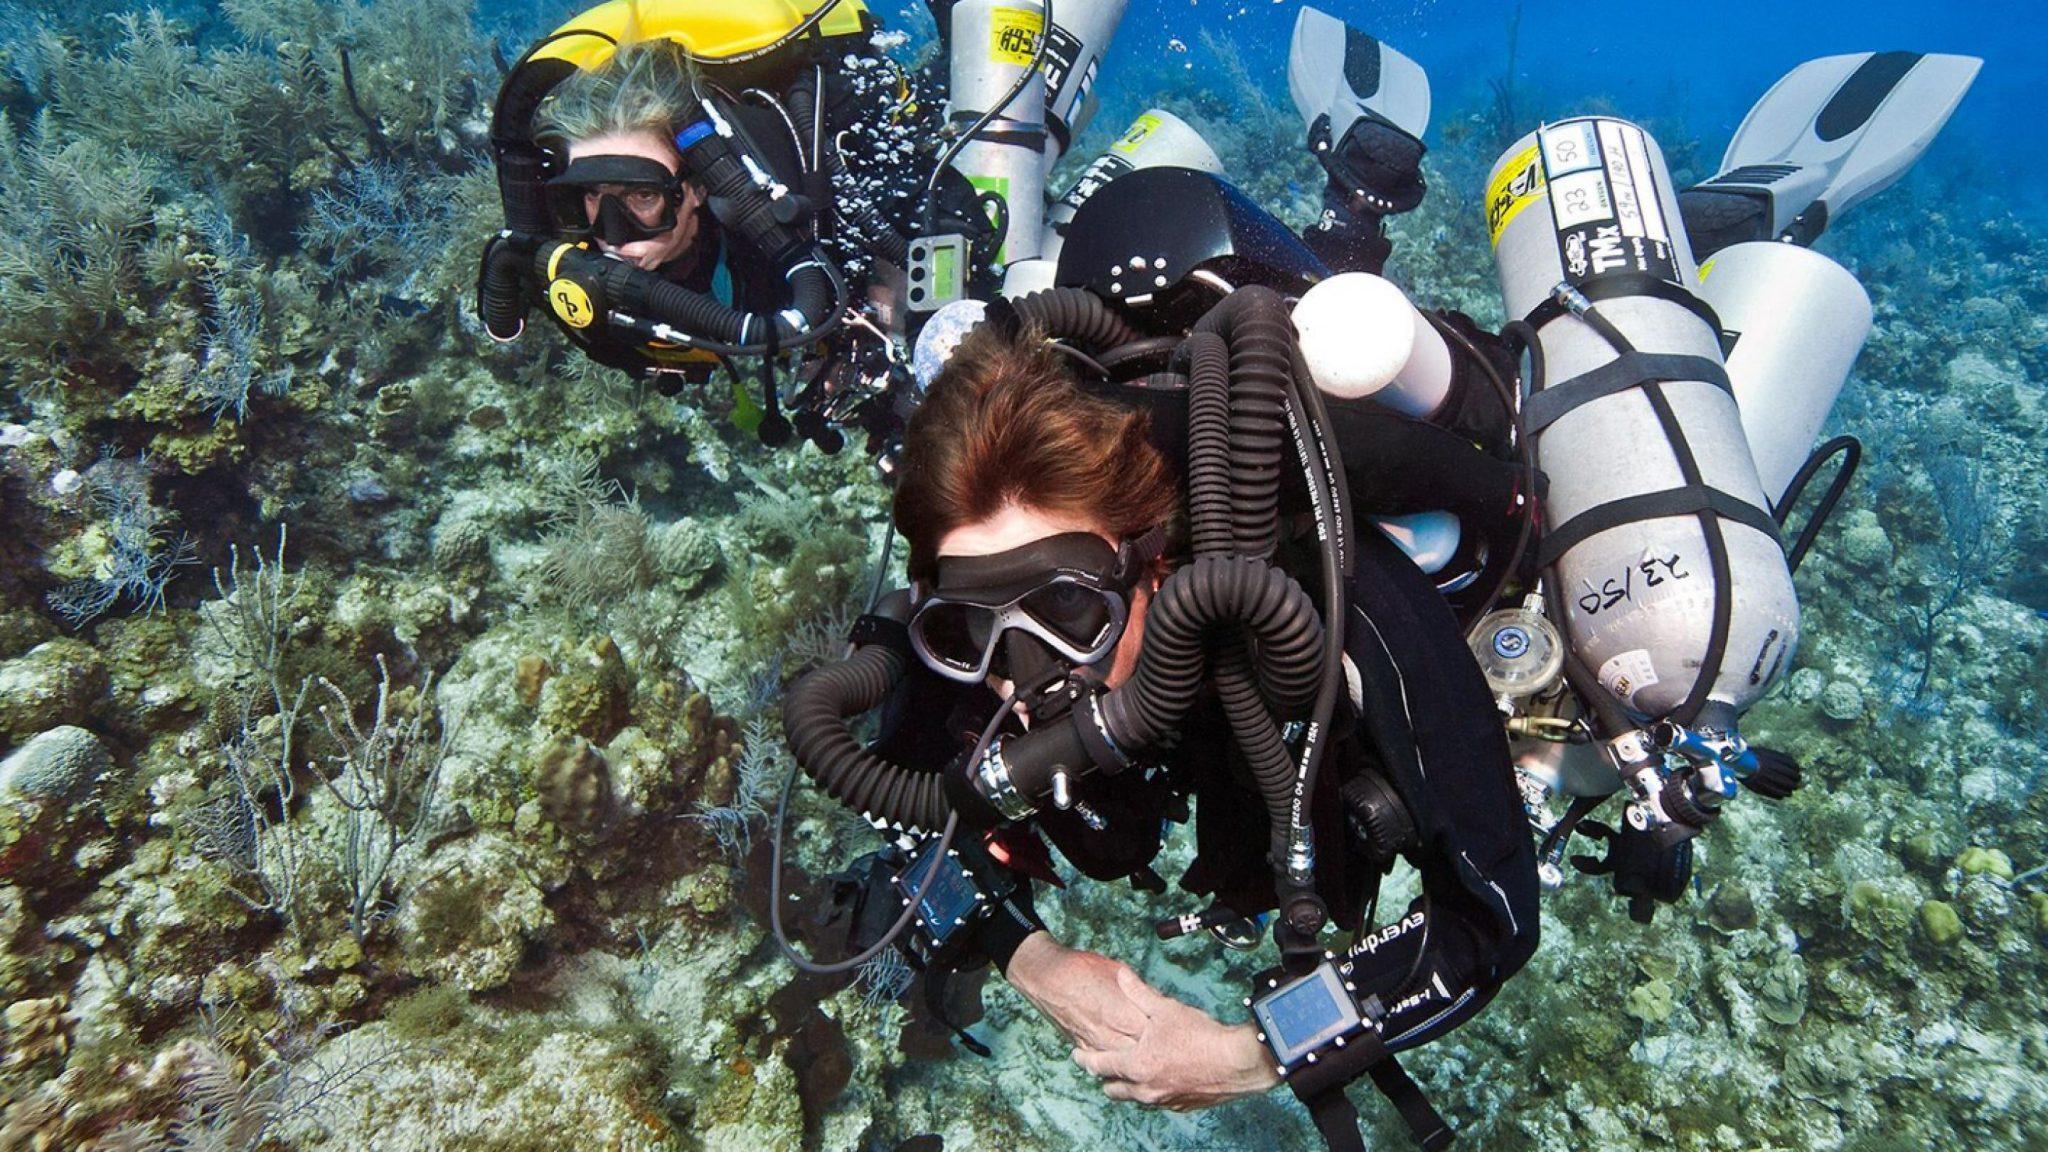 tec 100 closed circuit rebreather